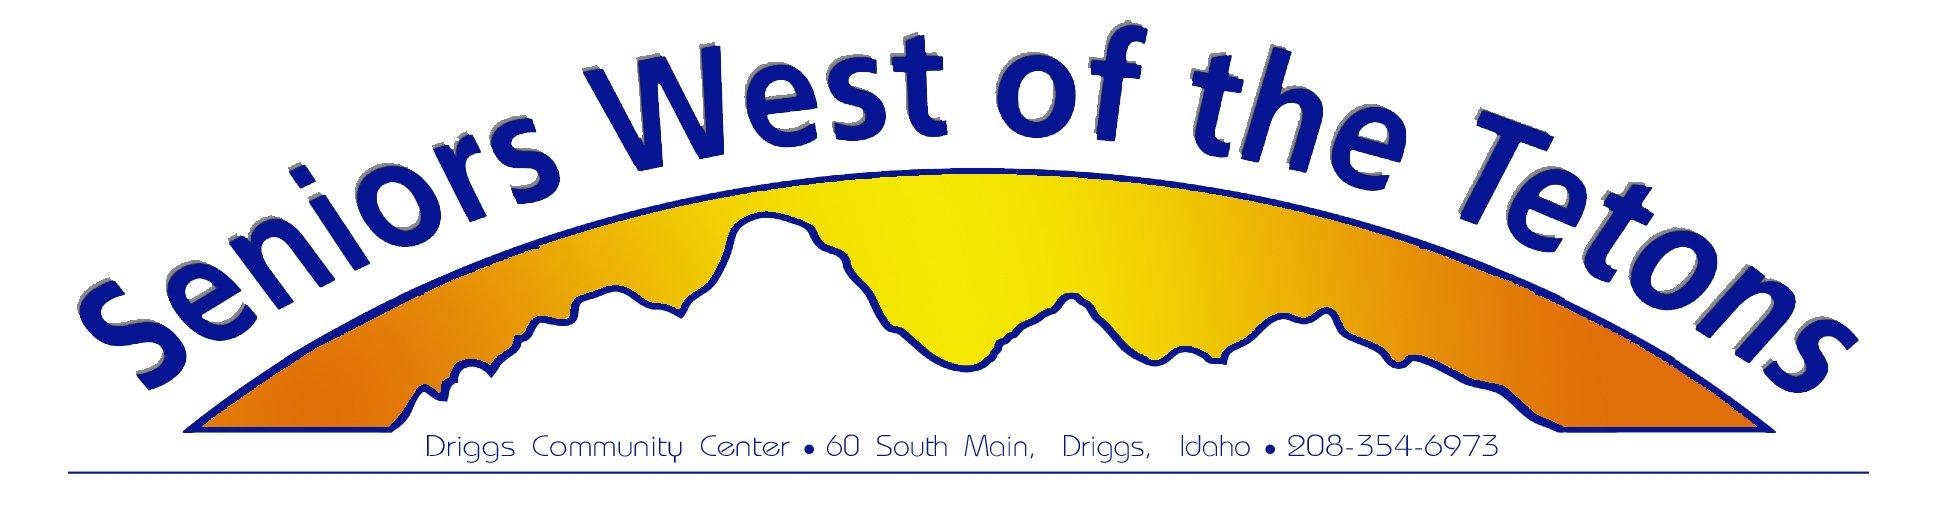 Seniors West of the Tetons